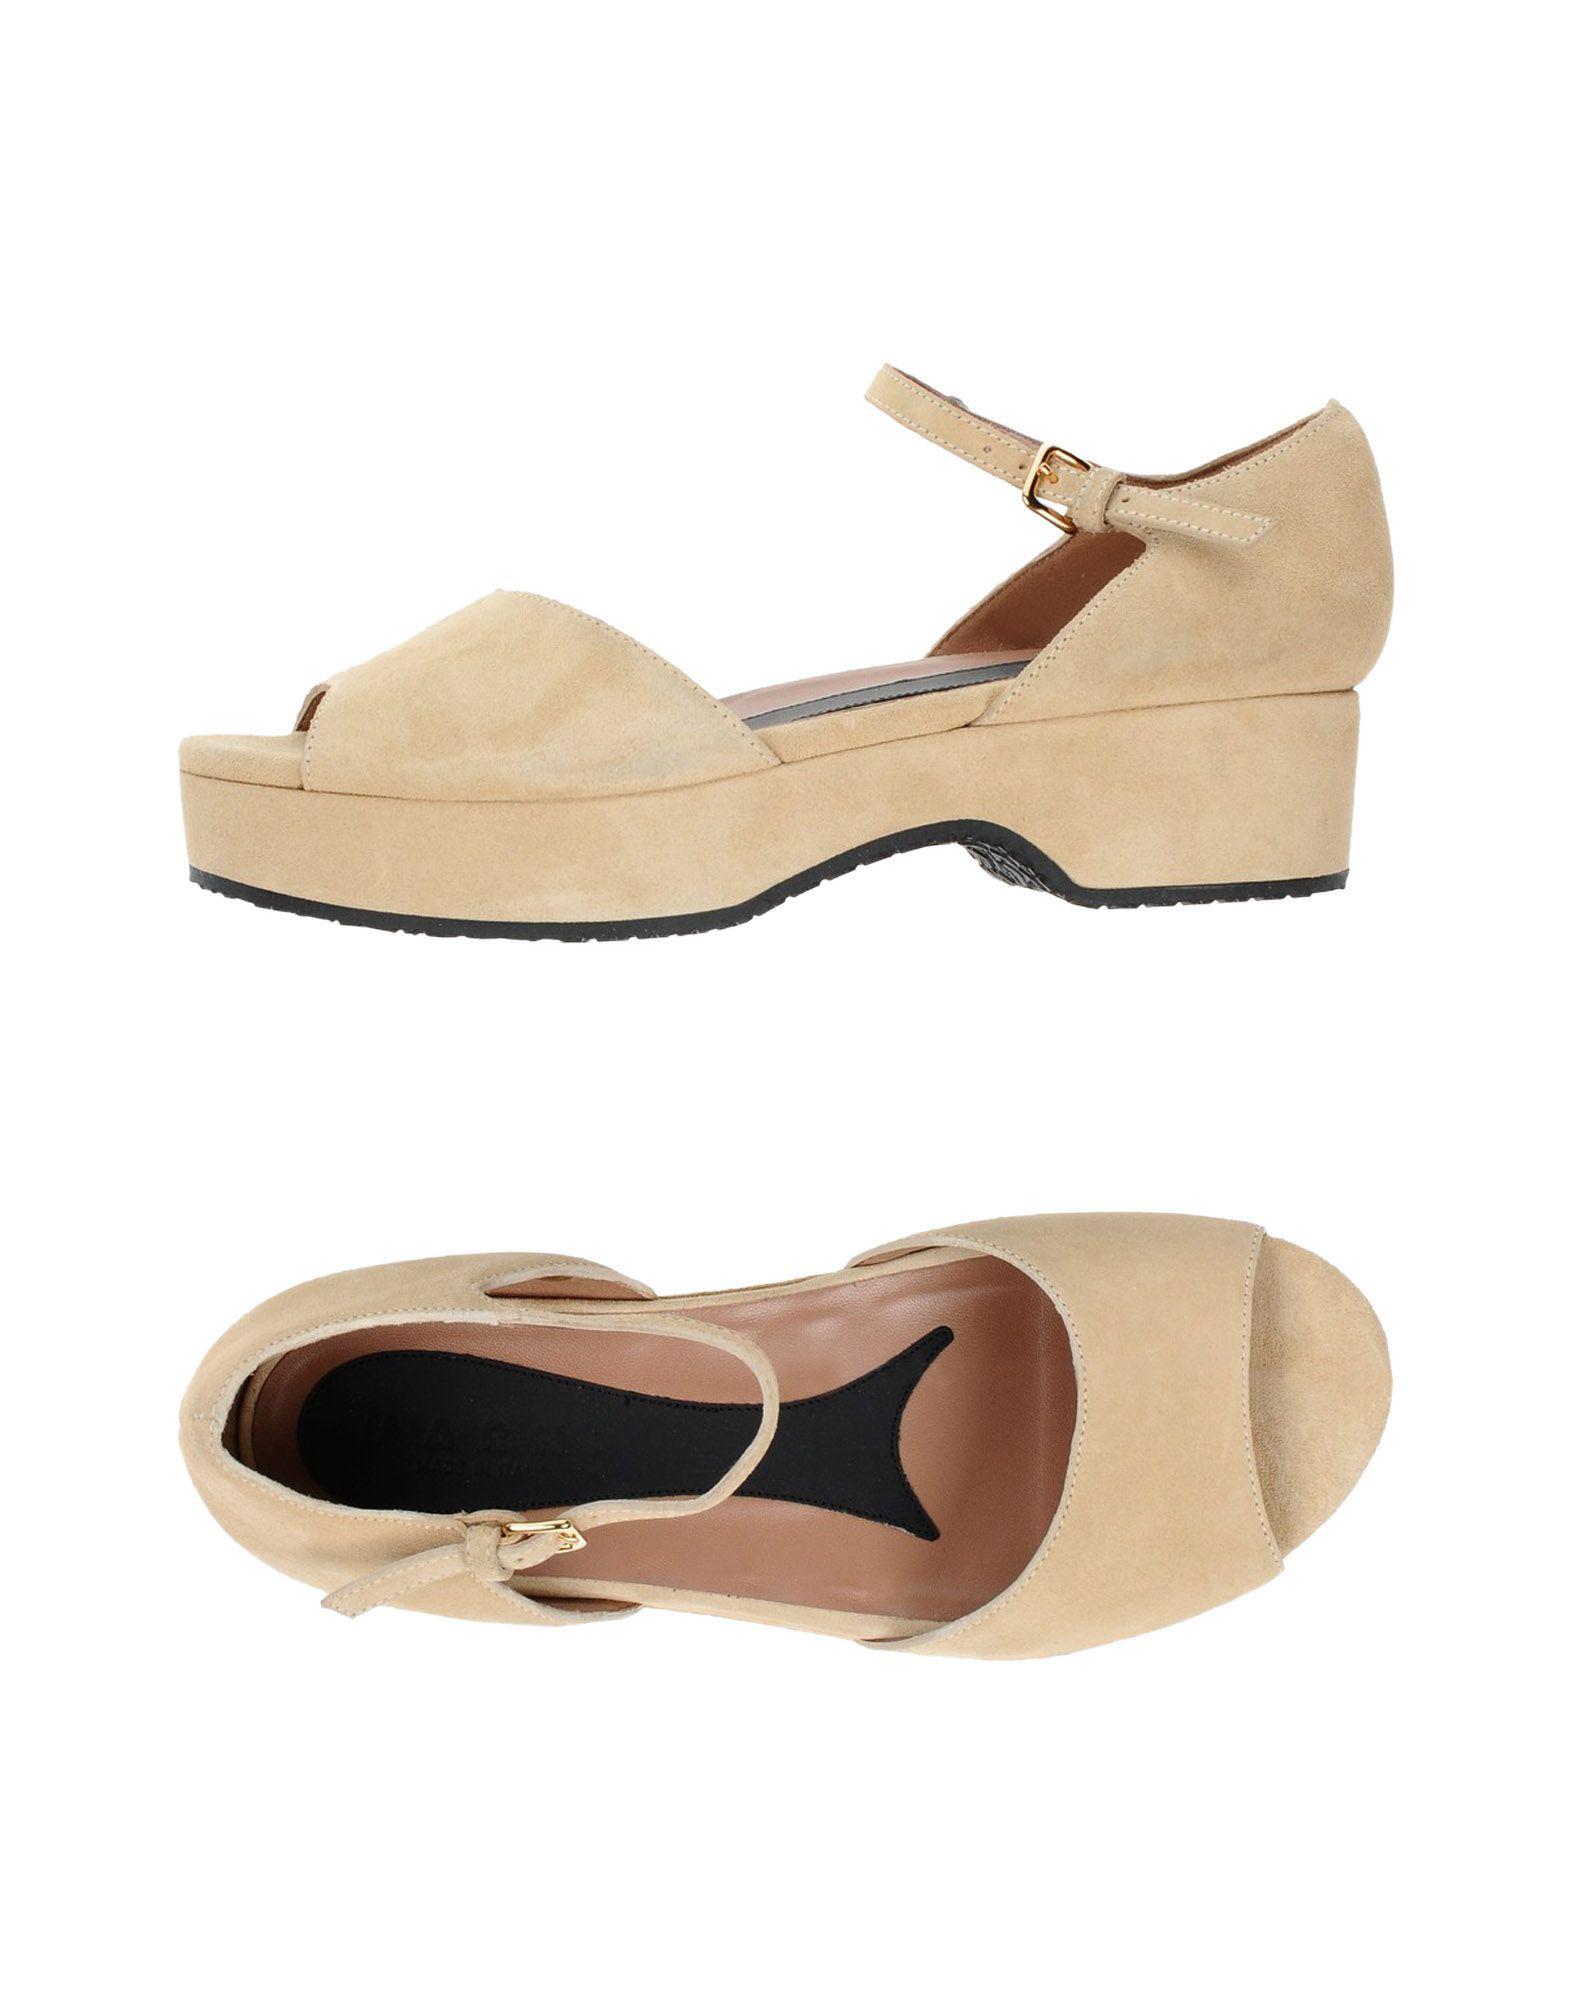 Marni Sandals - Women Marni Sandals online on United  United on Kingdom - 11433590KI 601c67